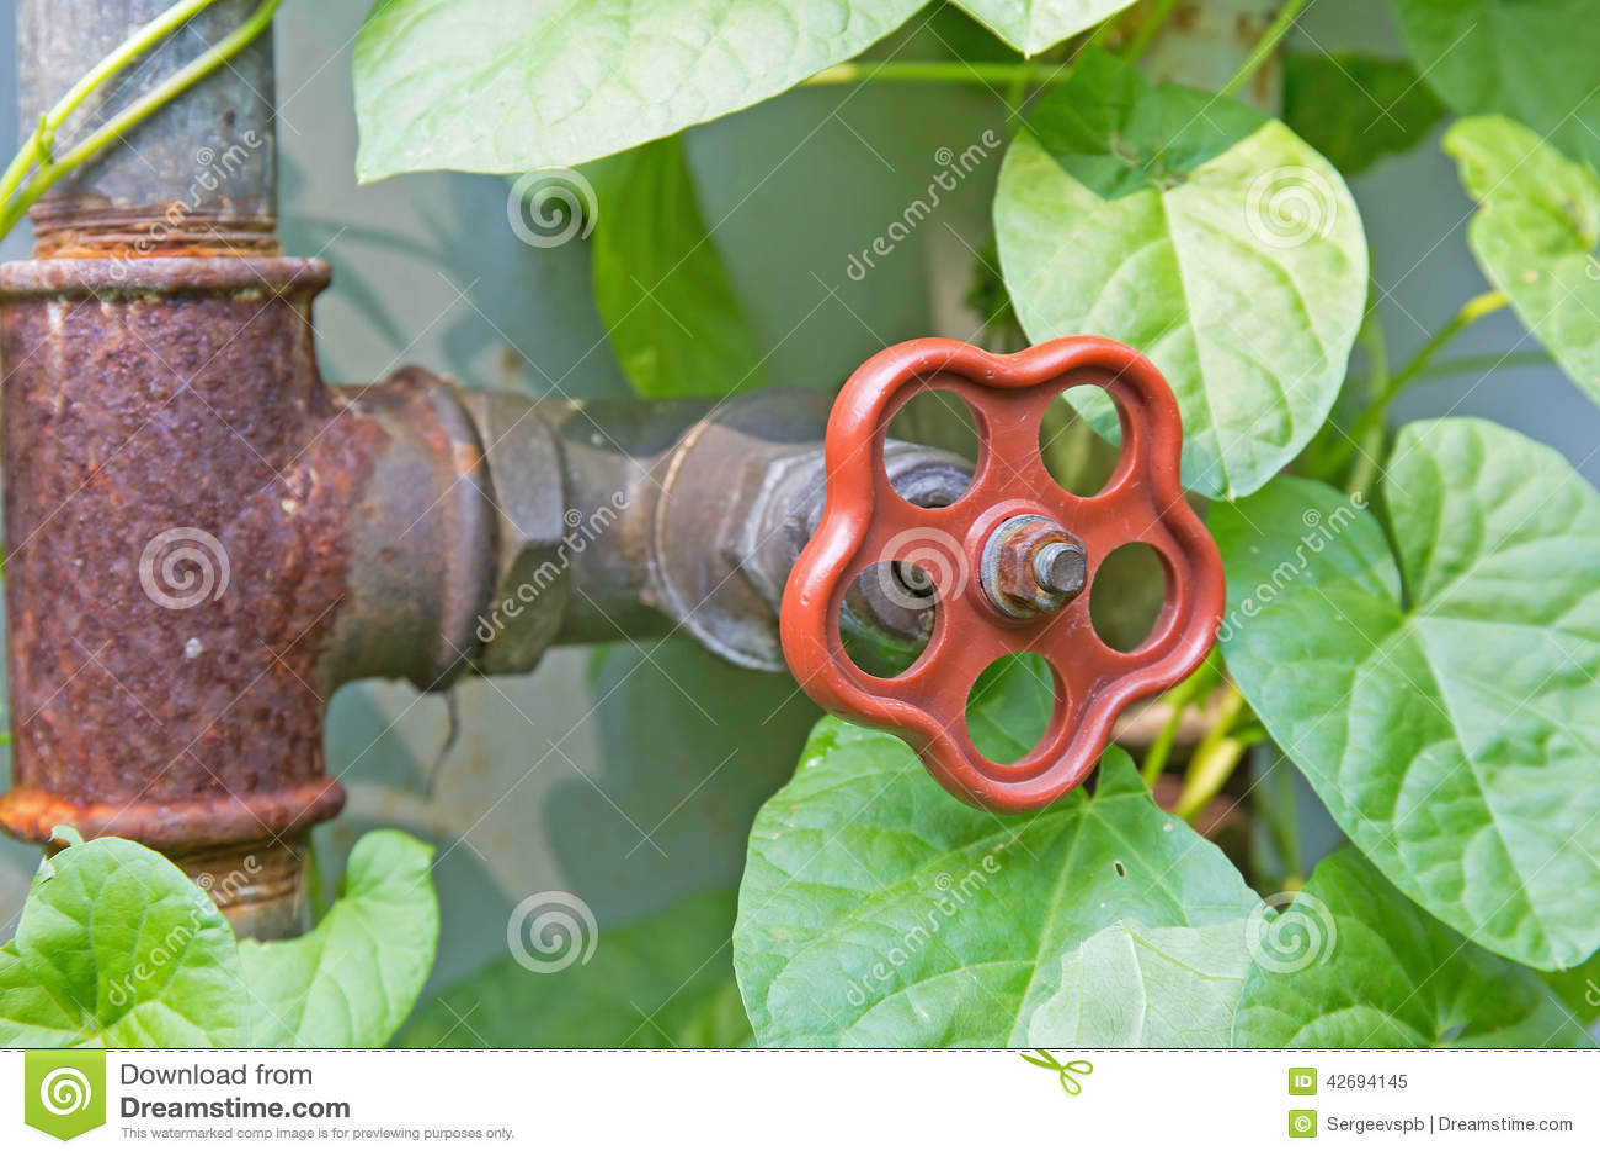 Download Dripping Garden Spigot Stock Image. Image Of Garden, Spigot    42694145